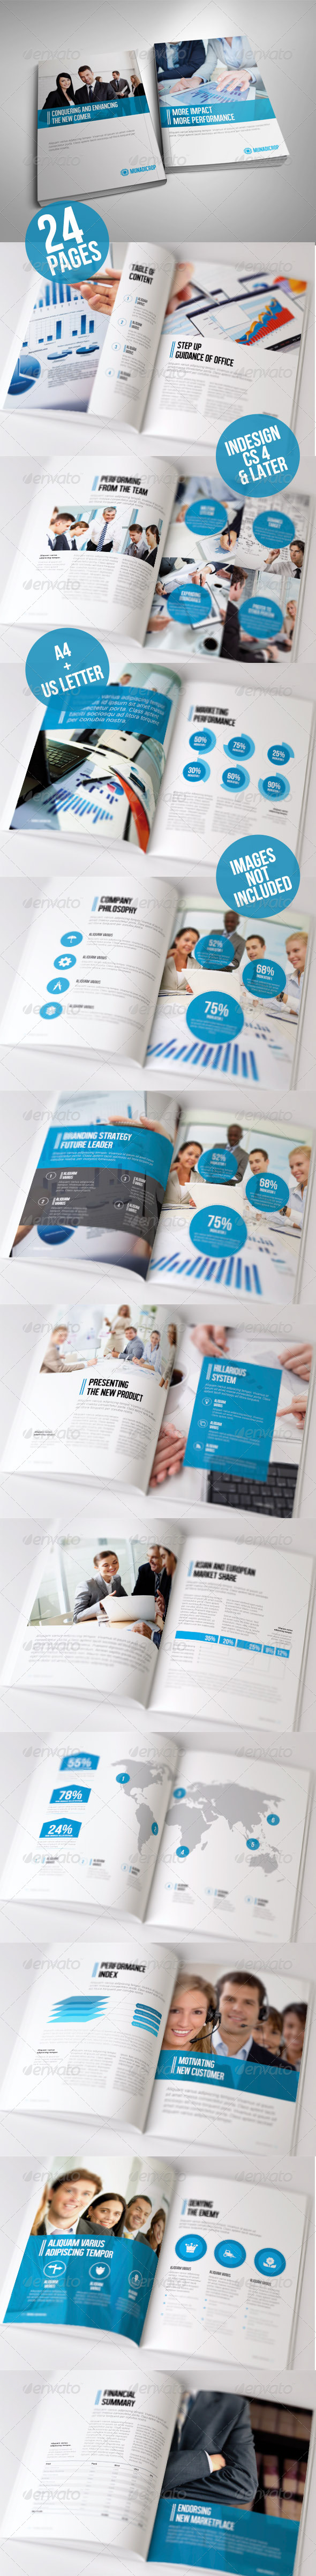 Kasongan Company Annual Report Volume 3 - Corporate Brochures